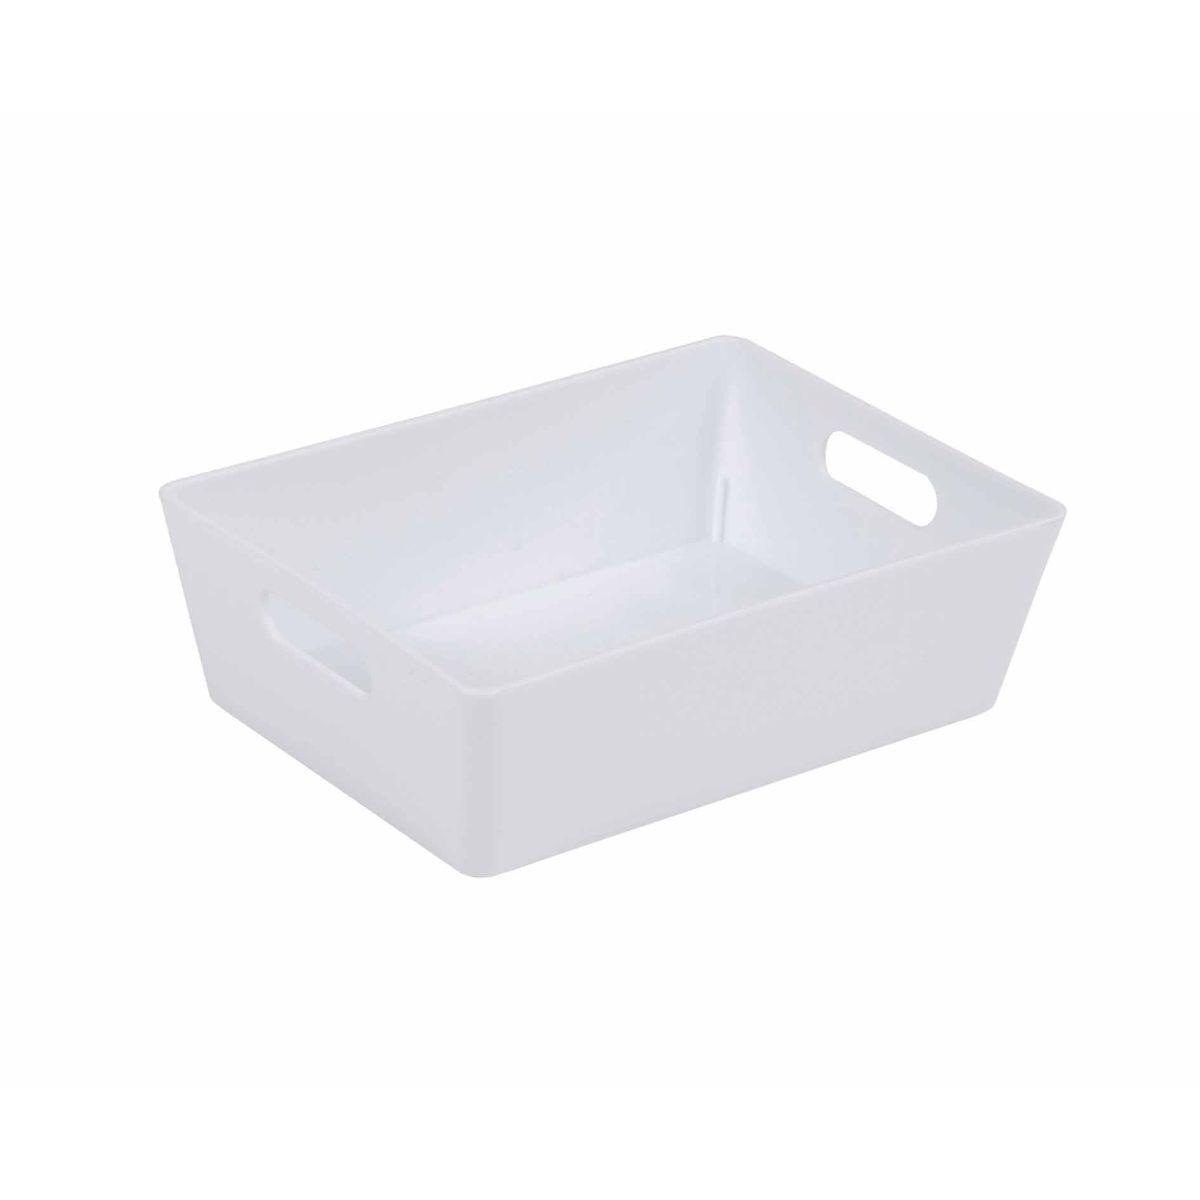 Wham Studio Rectangular Basket 3.01 White